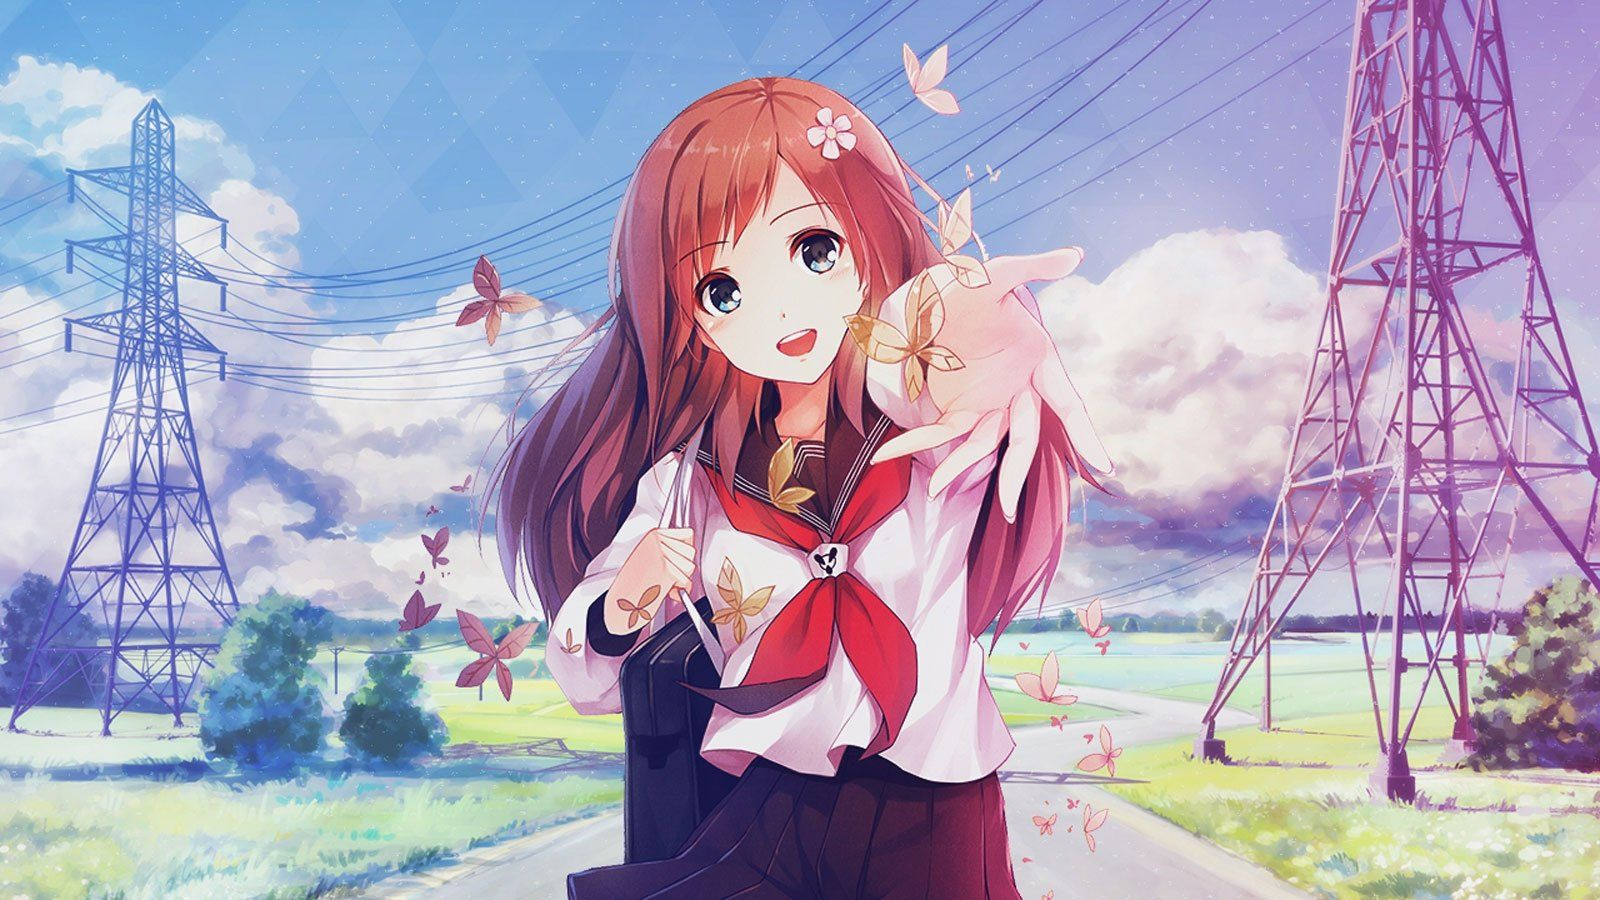 28 Cute Anime Girls Wallpapers On Wallpapersafari